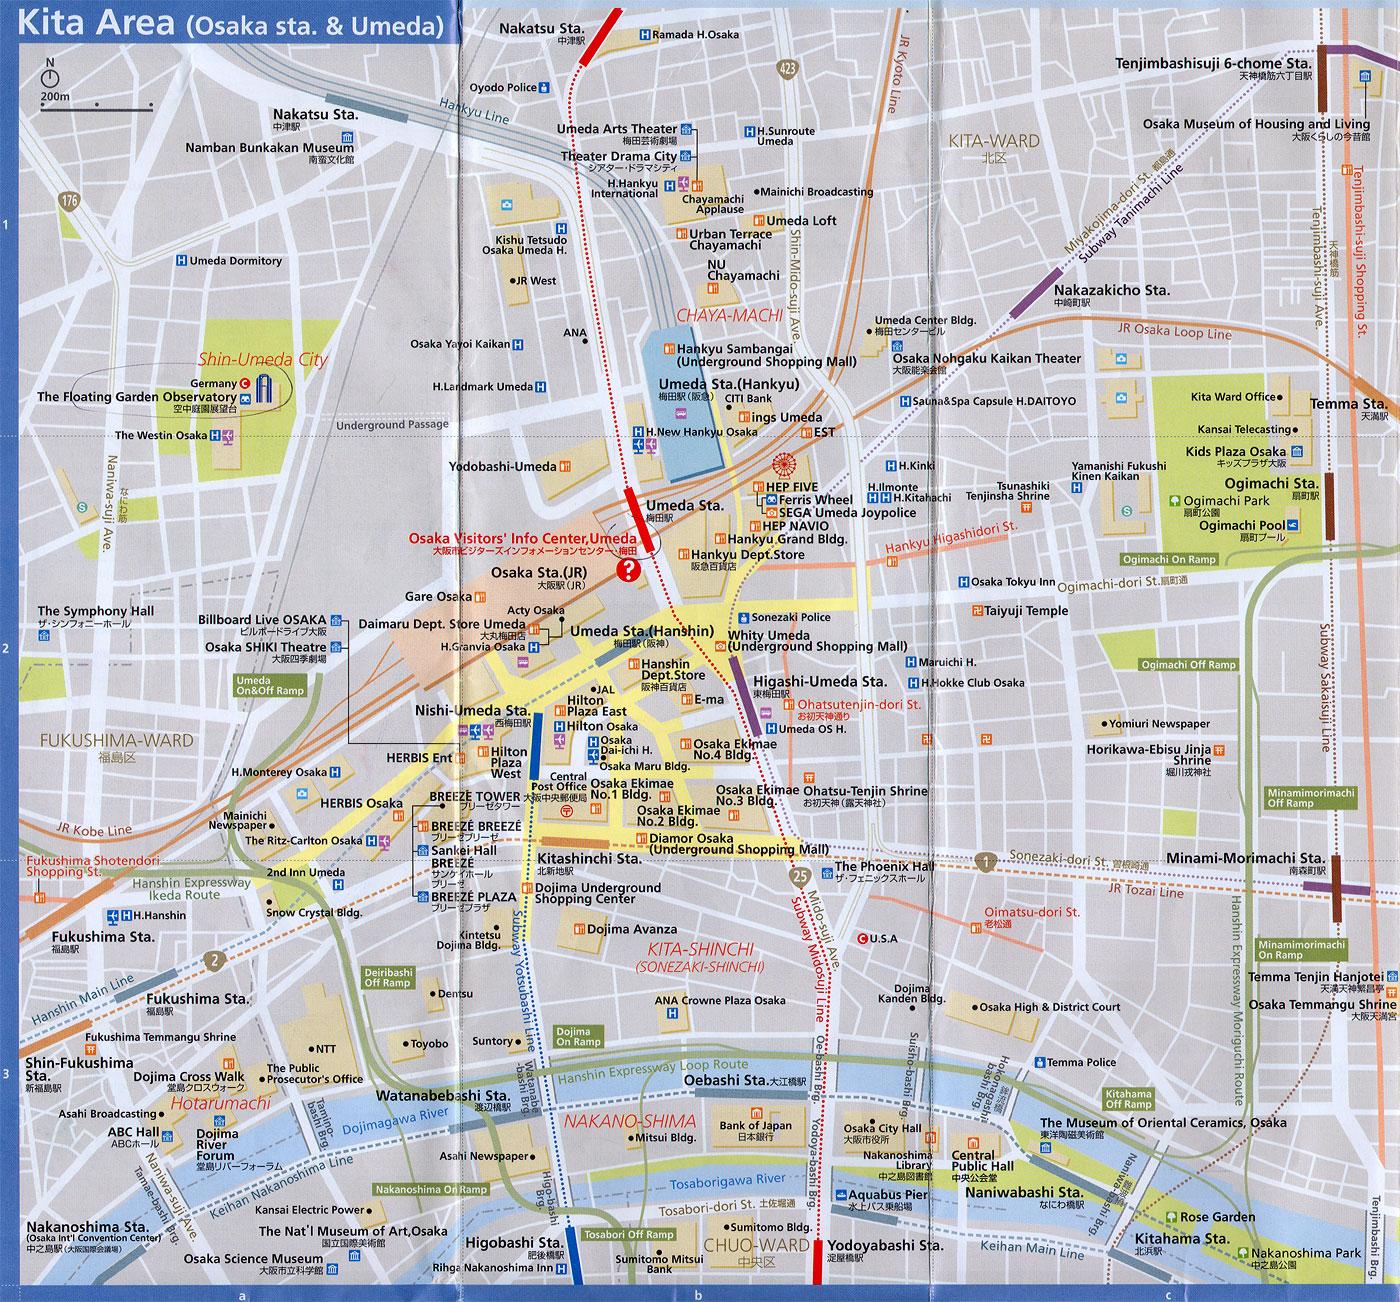 Subway Map 2009.Asisbiz 0 Kita Area Railway And Subway Map Brochure Nov 2009